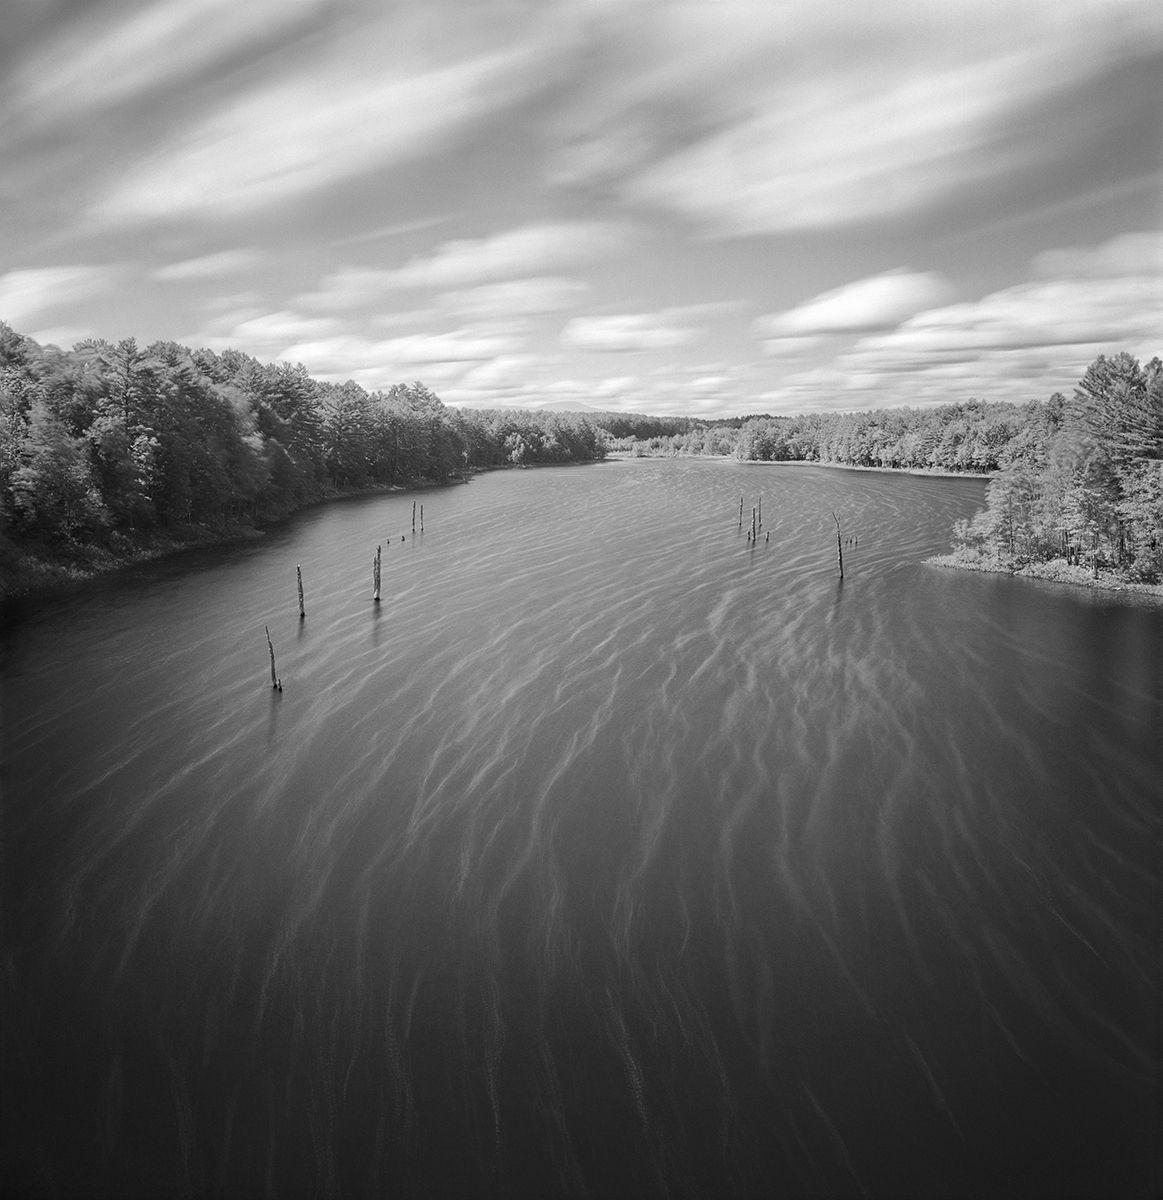 Windy River Crop Full Res copy.jpg